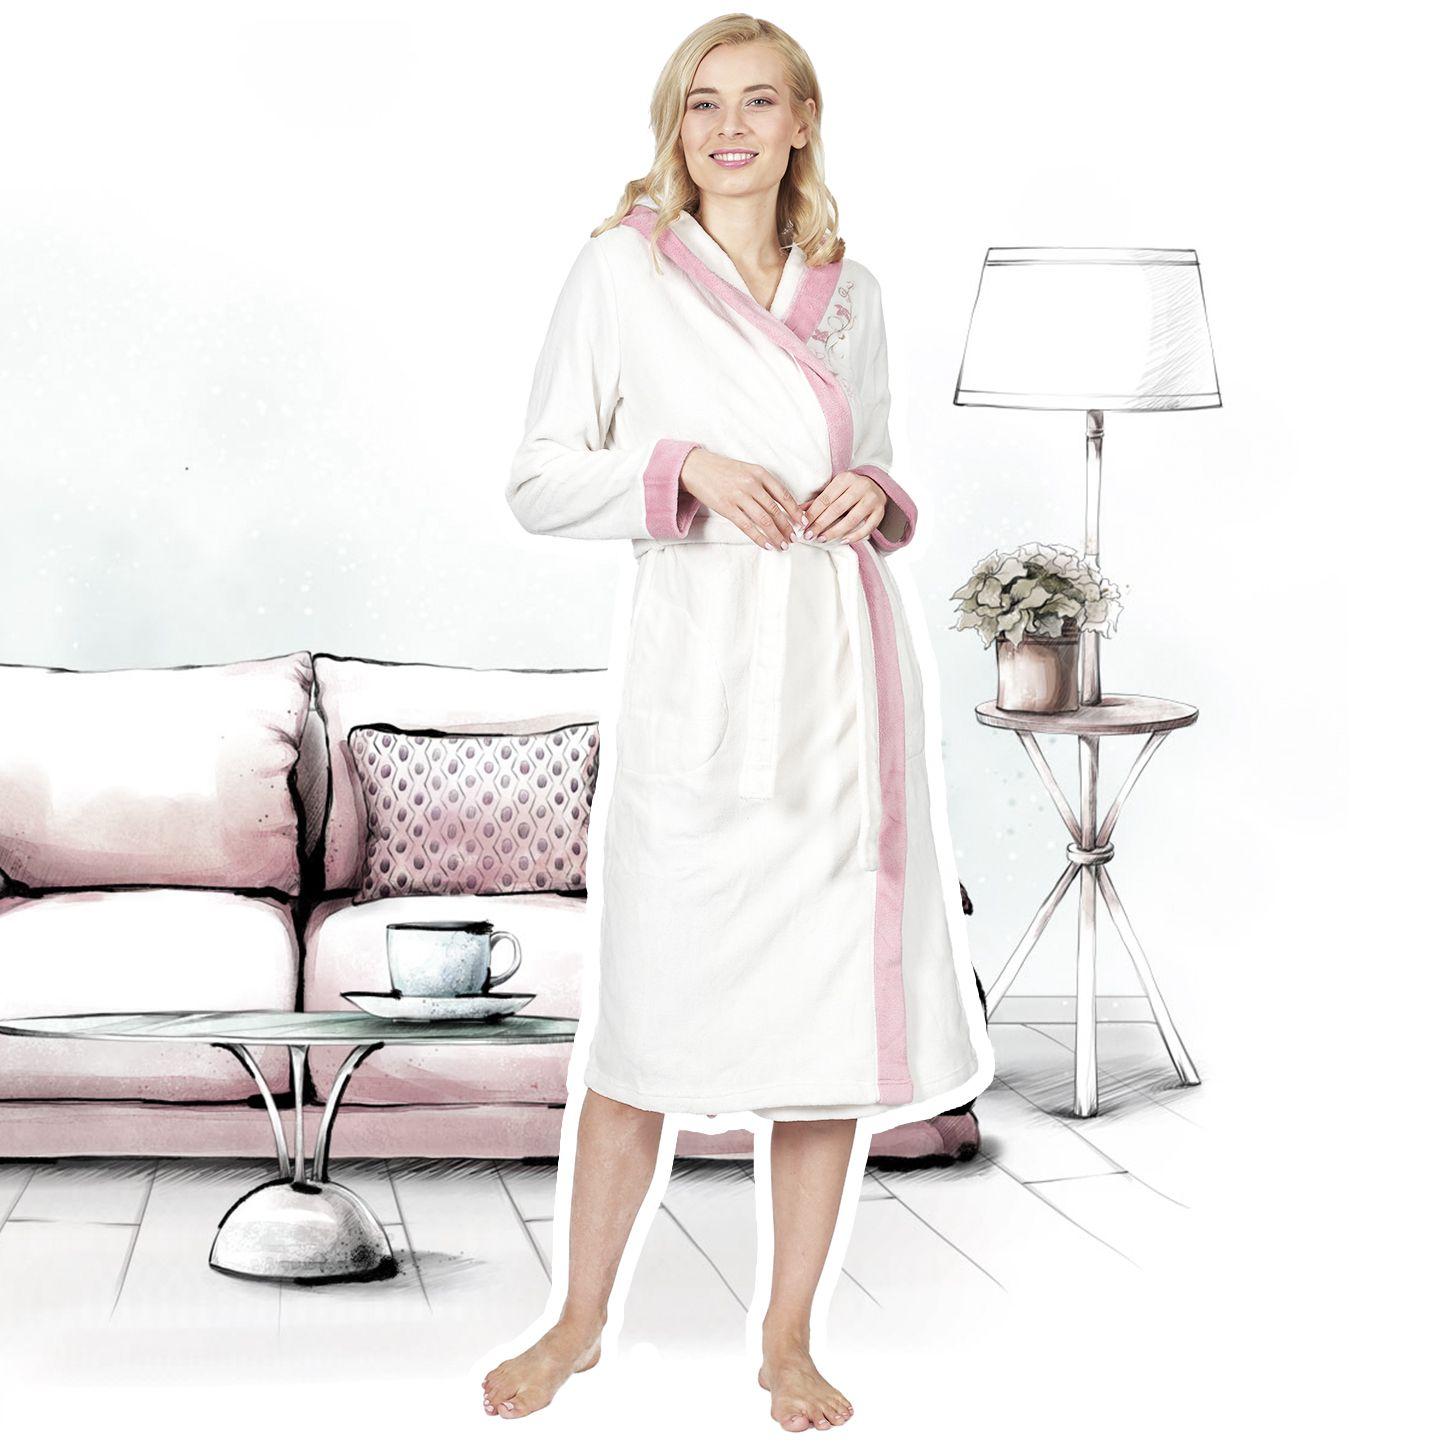 RAIKOU Neu Damen Bademantel Morgenmantel Saunamantel mit Kapuze mit hohem Baumwollanteil